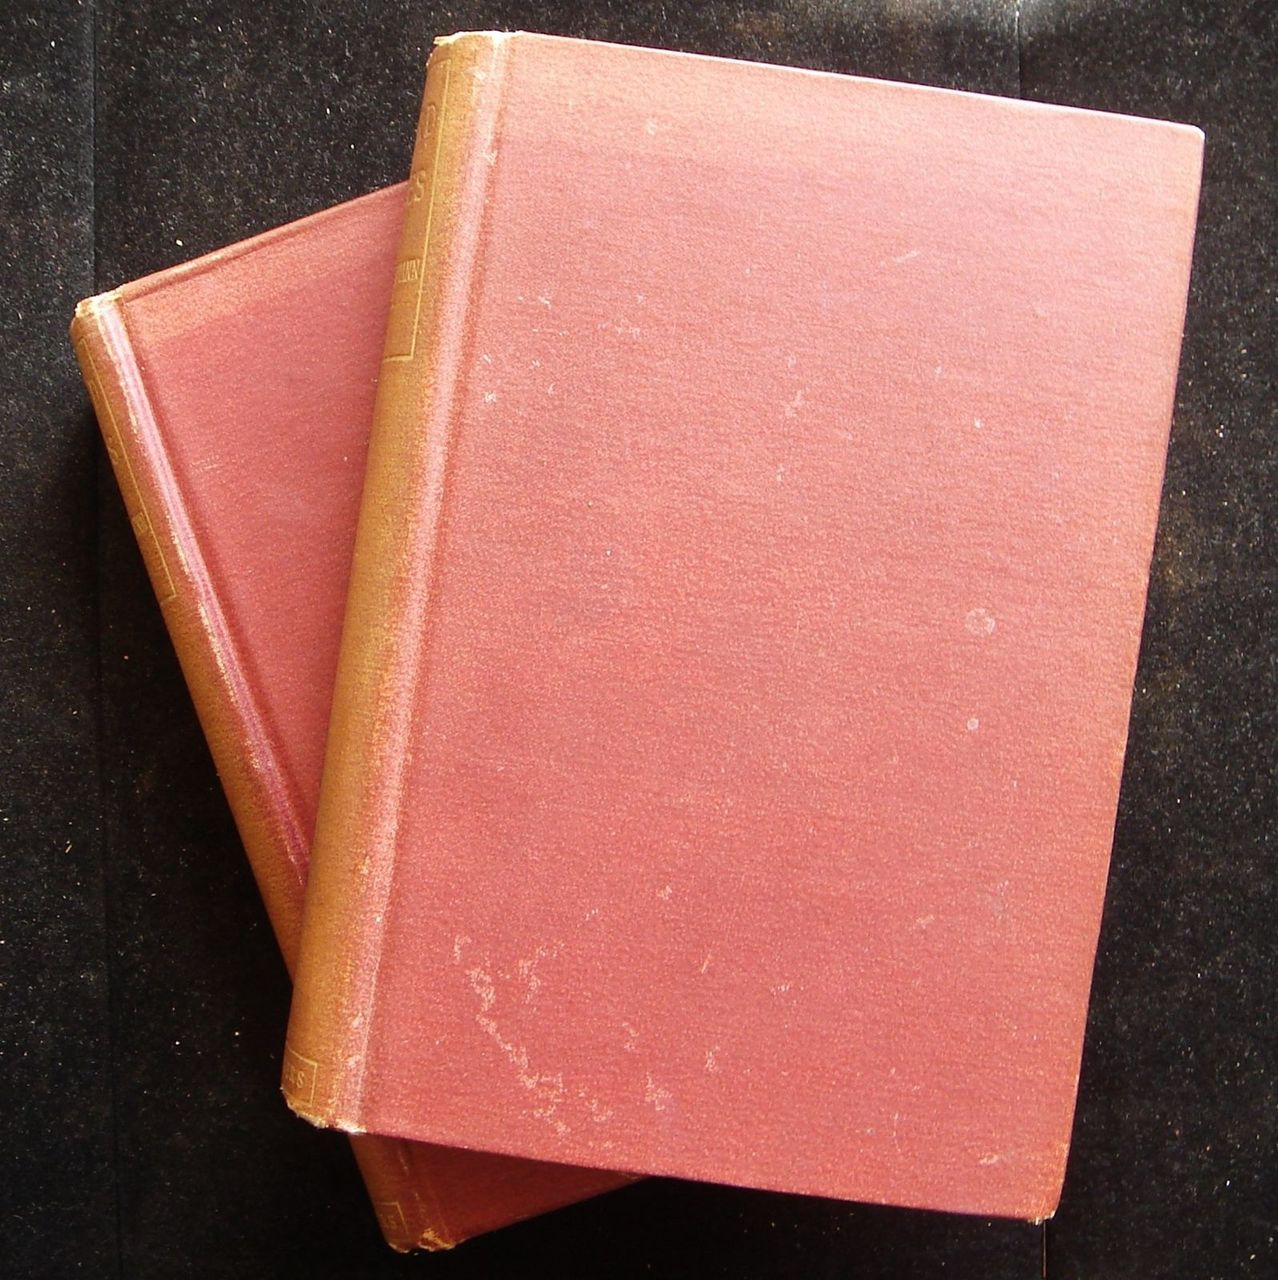 WEIRD TALES, Vol 1 & 2, by E.T.W. Hoffmann - 1885 [1st Ed]